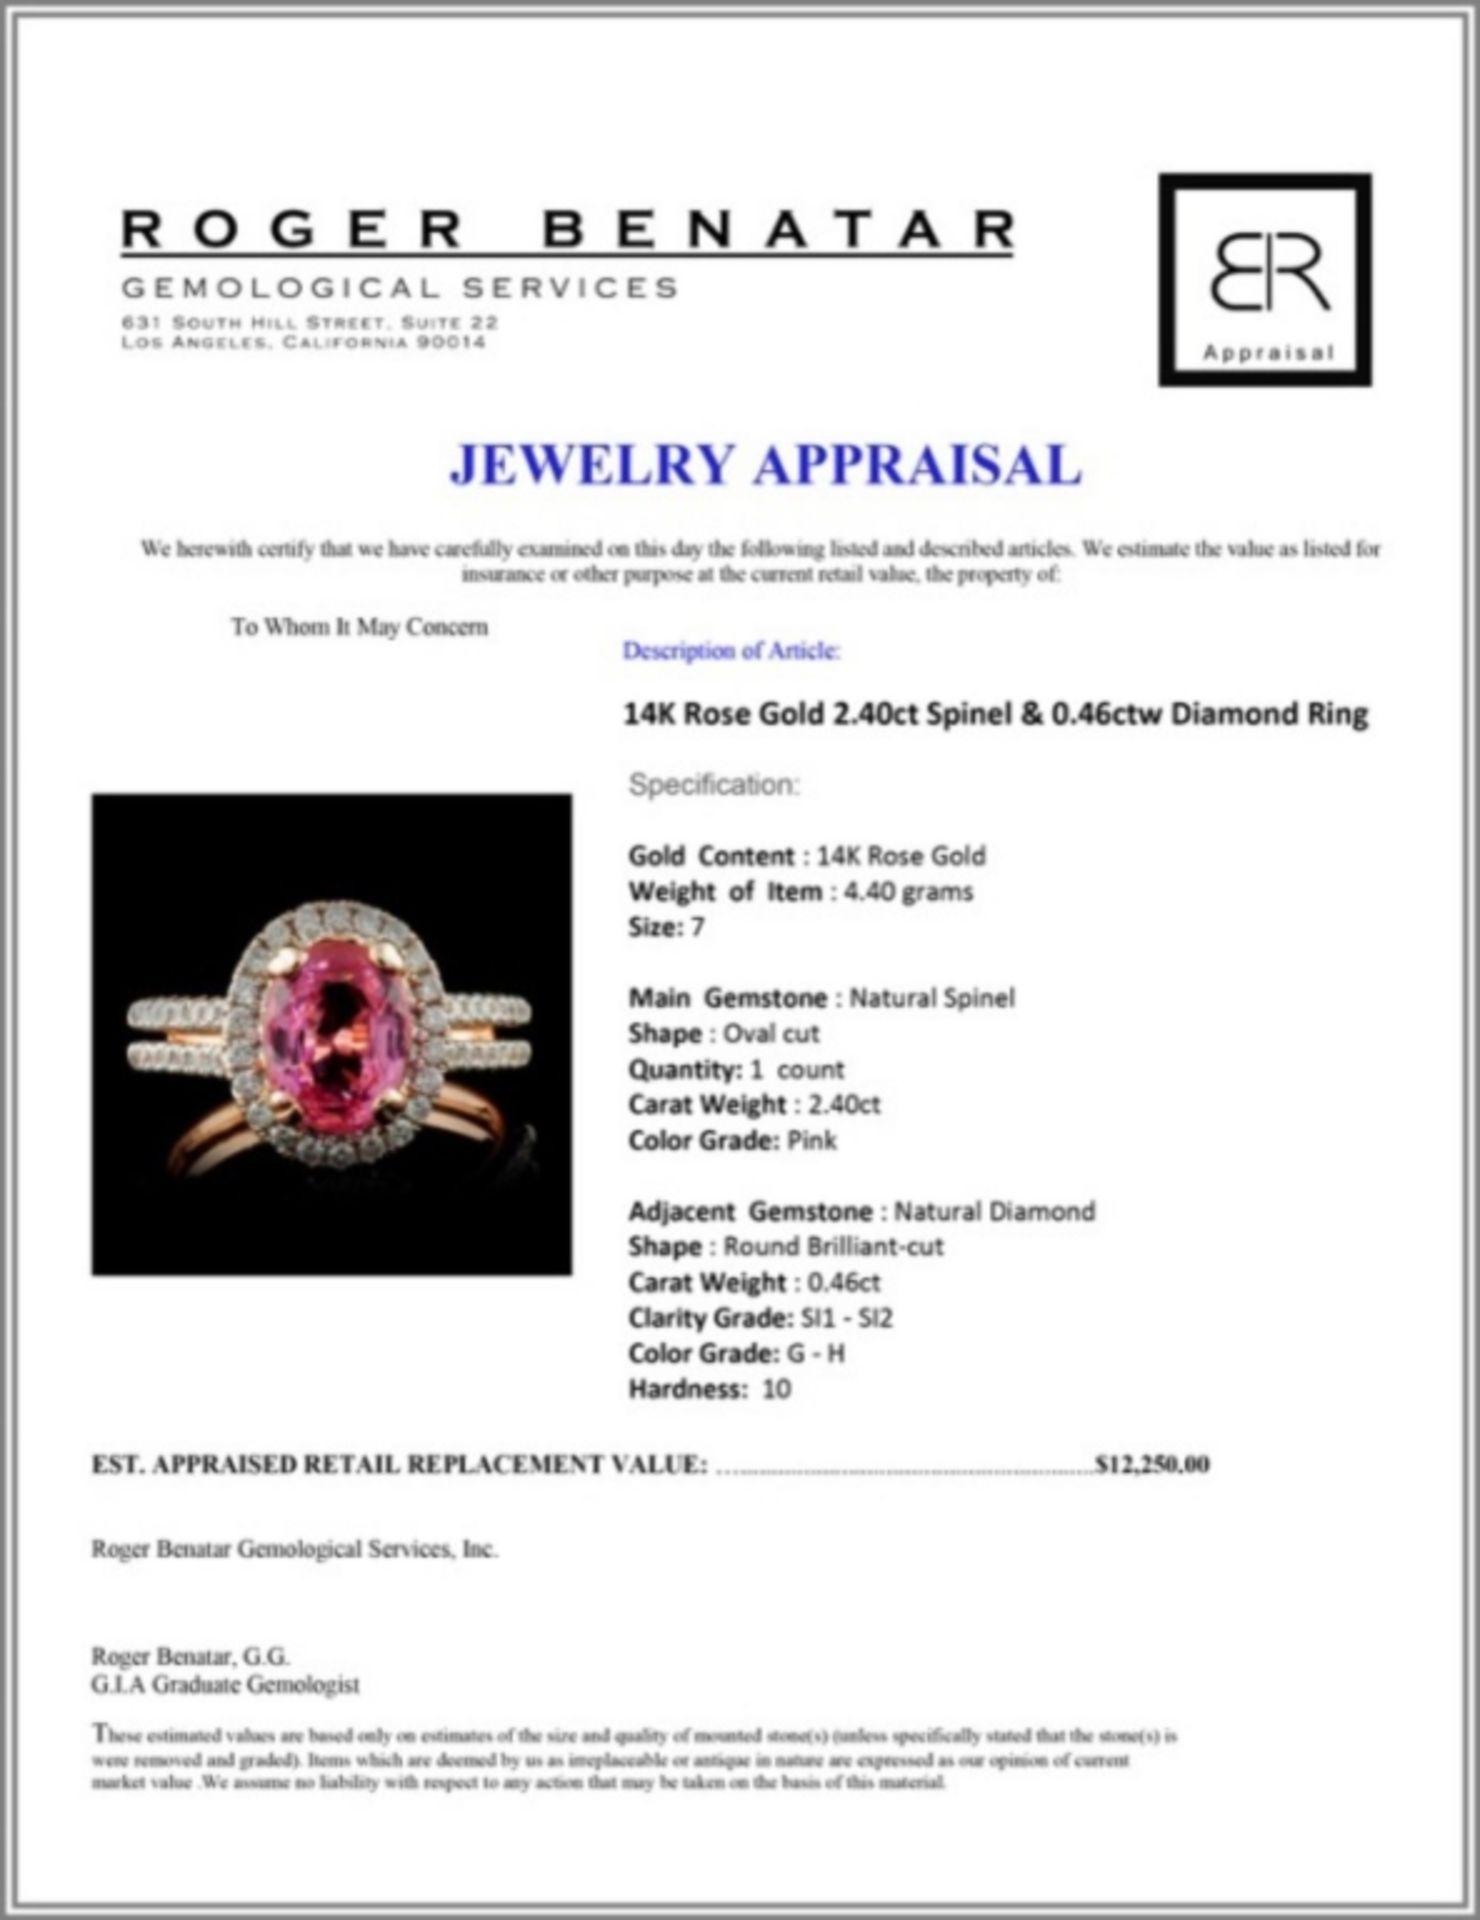 14K Rose Gold 2.40ct Spinel & 0.46ctw Diamond Ring - Image 4 of 4